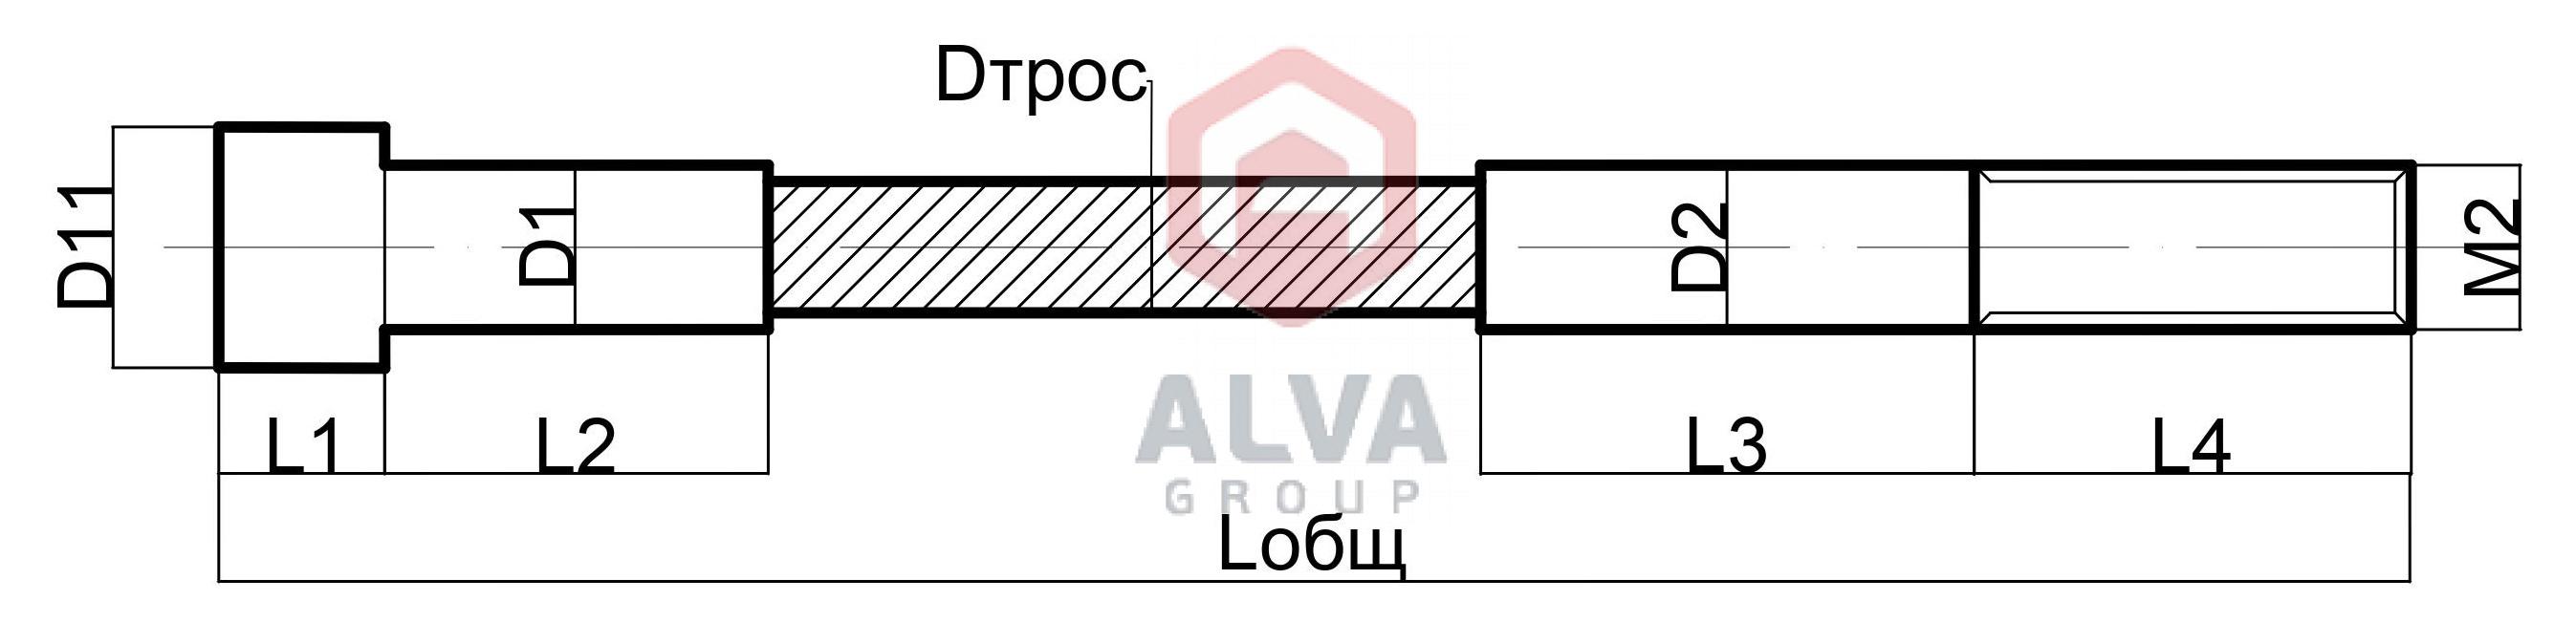 Трос тип 1